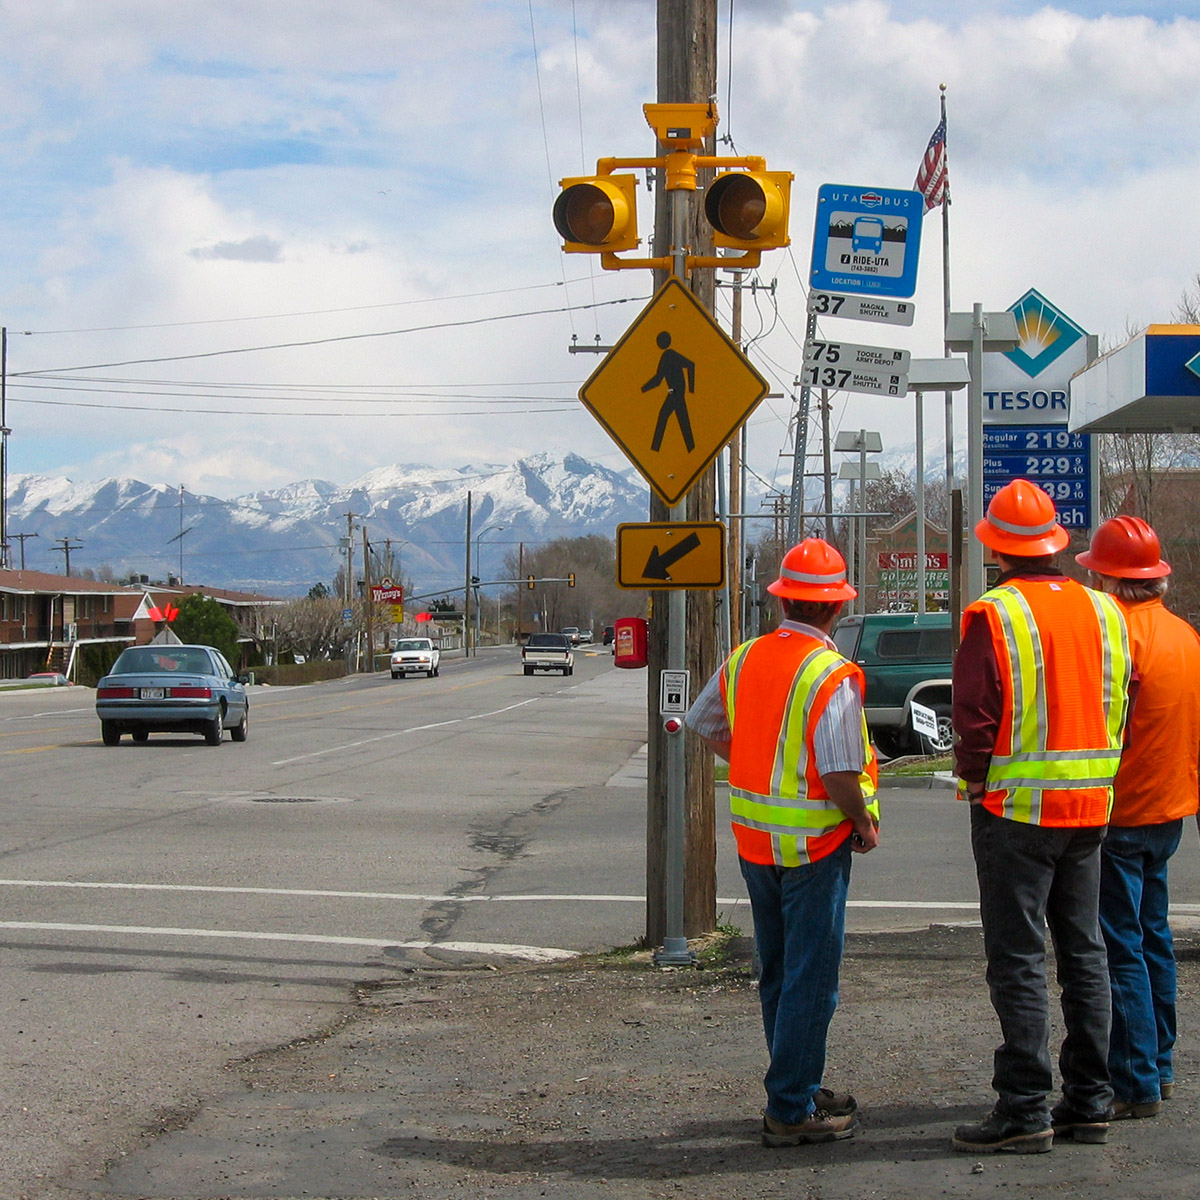 solar-powered crosswalk beacon with installers